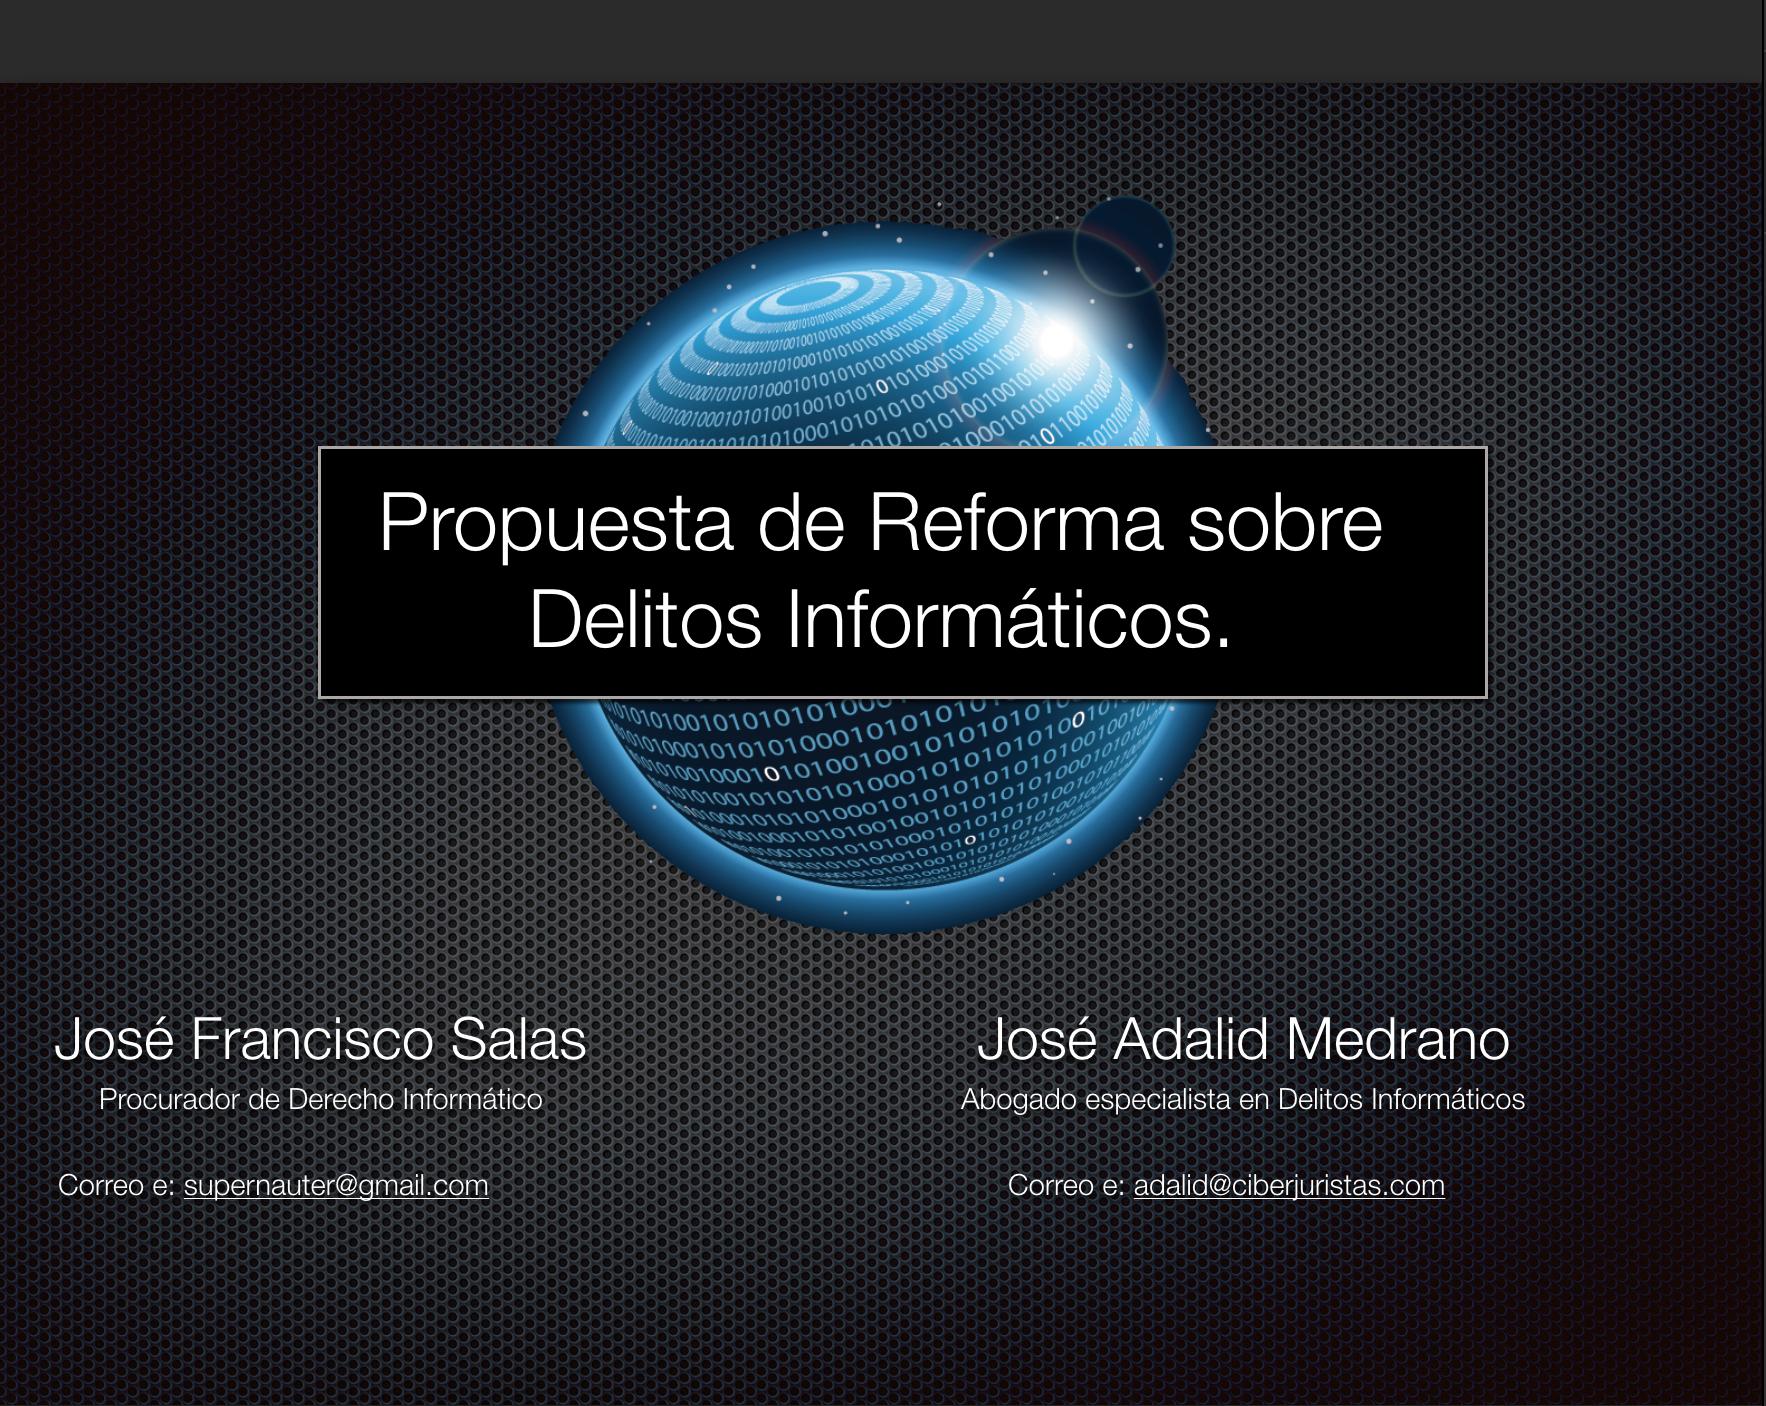 https://adalidmedrano.com/wp-content/uploads/2018/11/proyecto-de-ley-sobre-delitos-informaticos.png